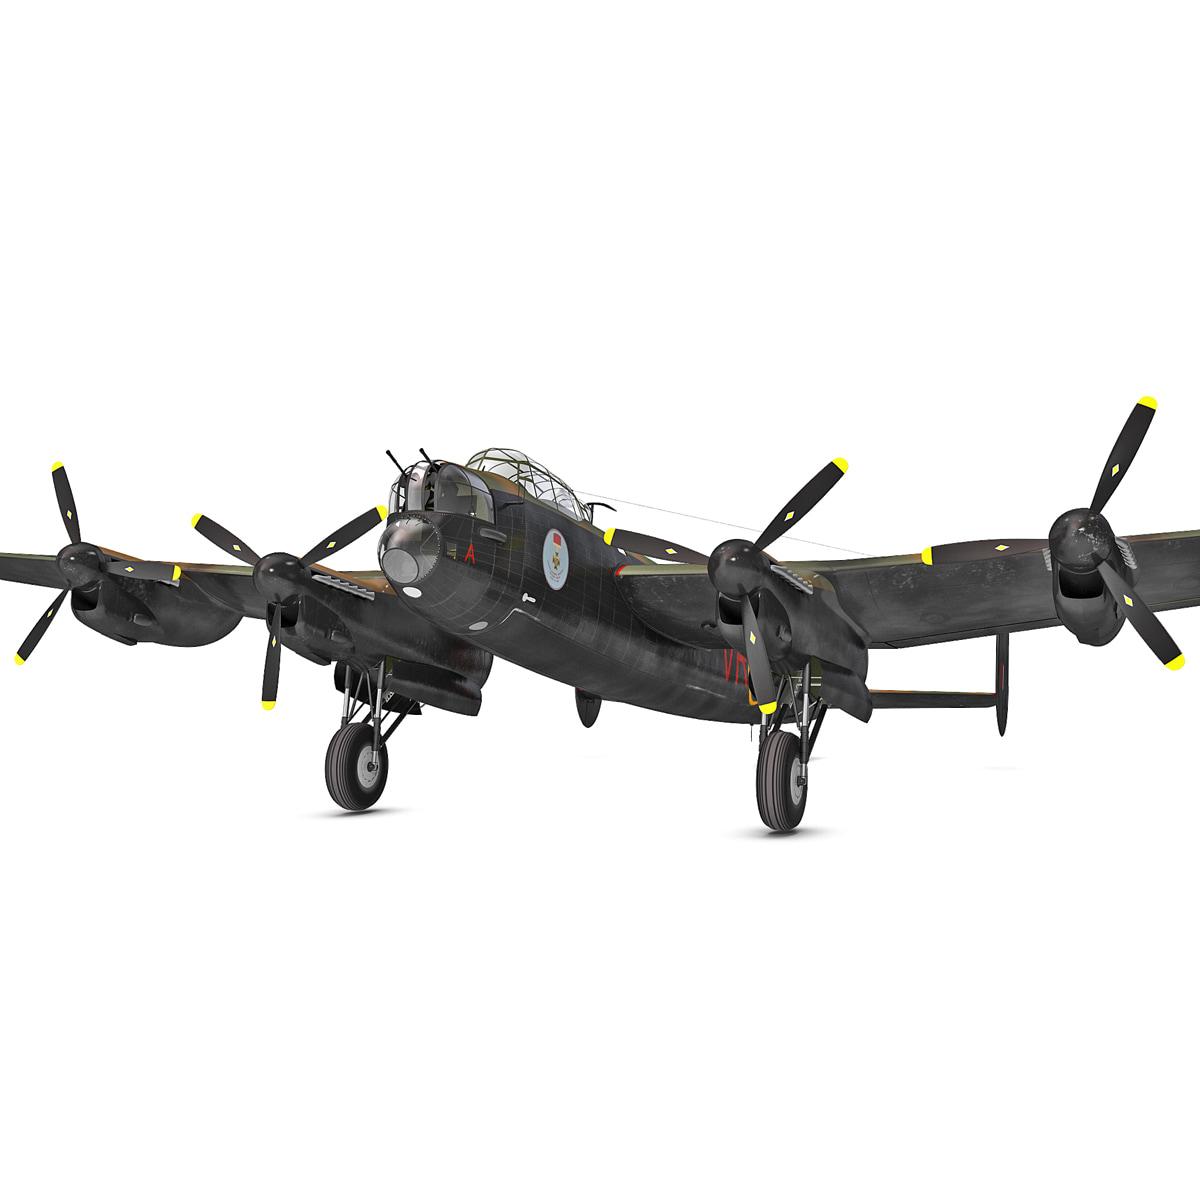 British Heavy Bomber Avro Lancaster Rigged_22.jpg